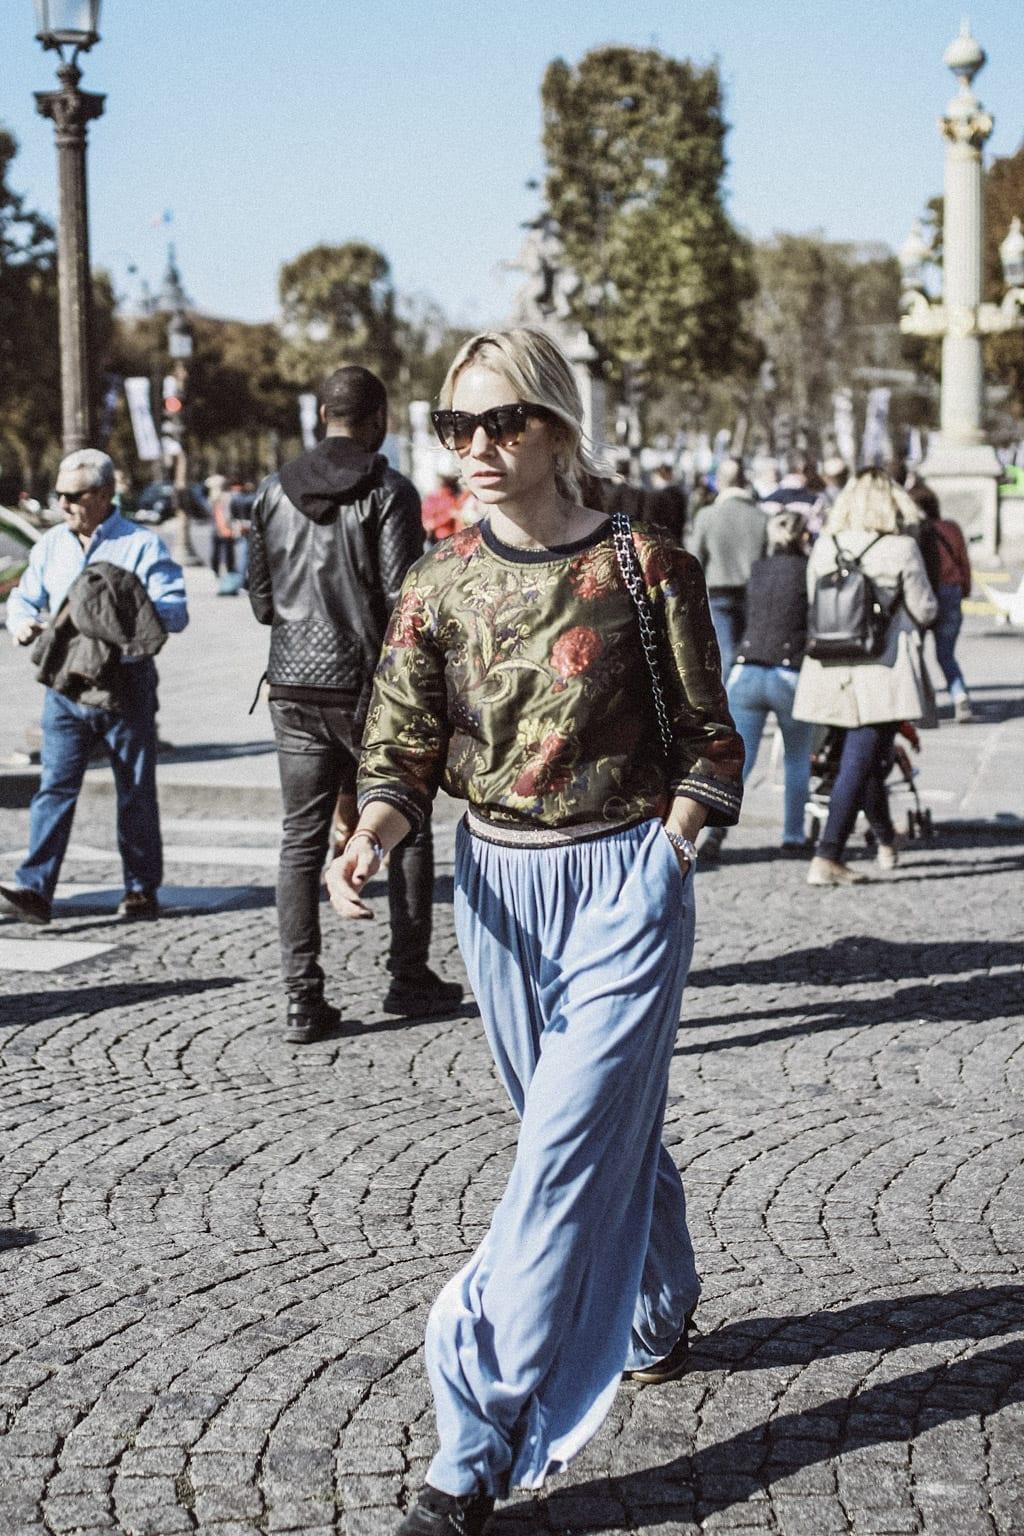 ck-constantlyk-com-paris-fashion-karin-kaswurm-georg-teigl-street-style-9768